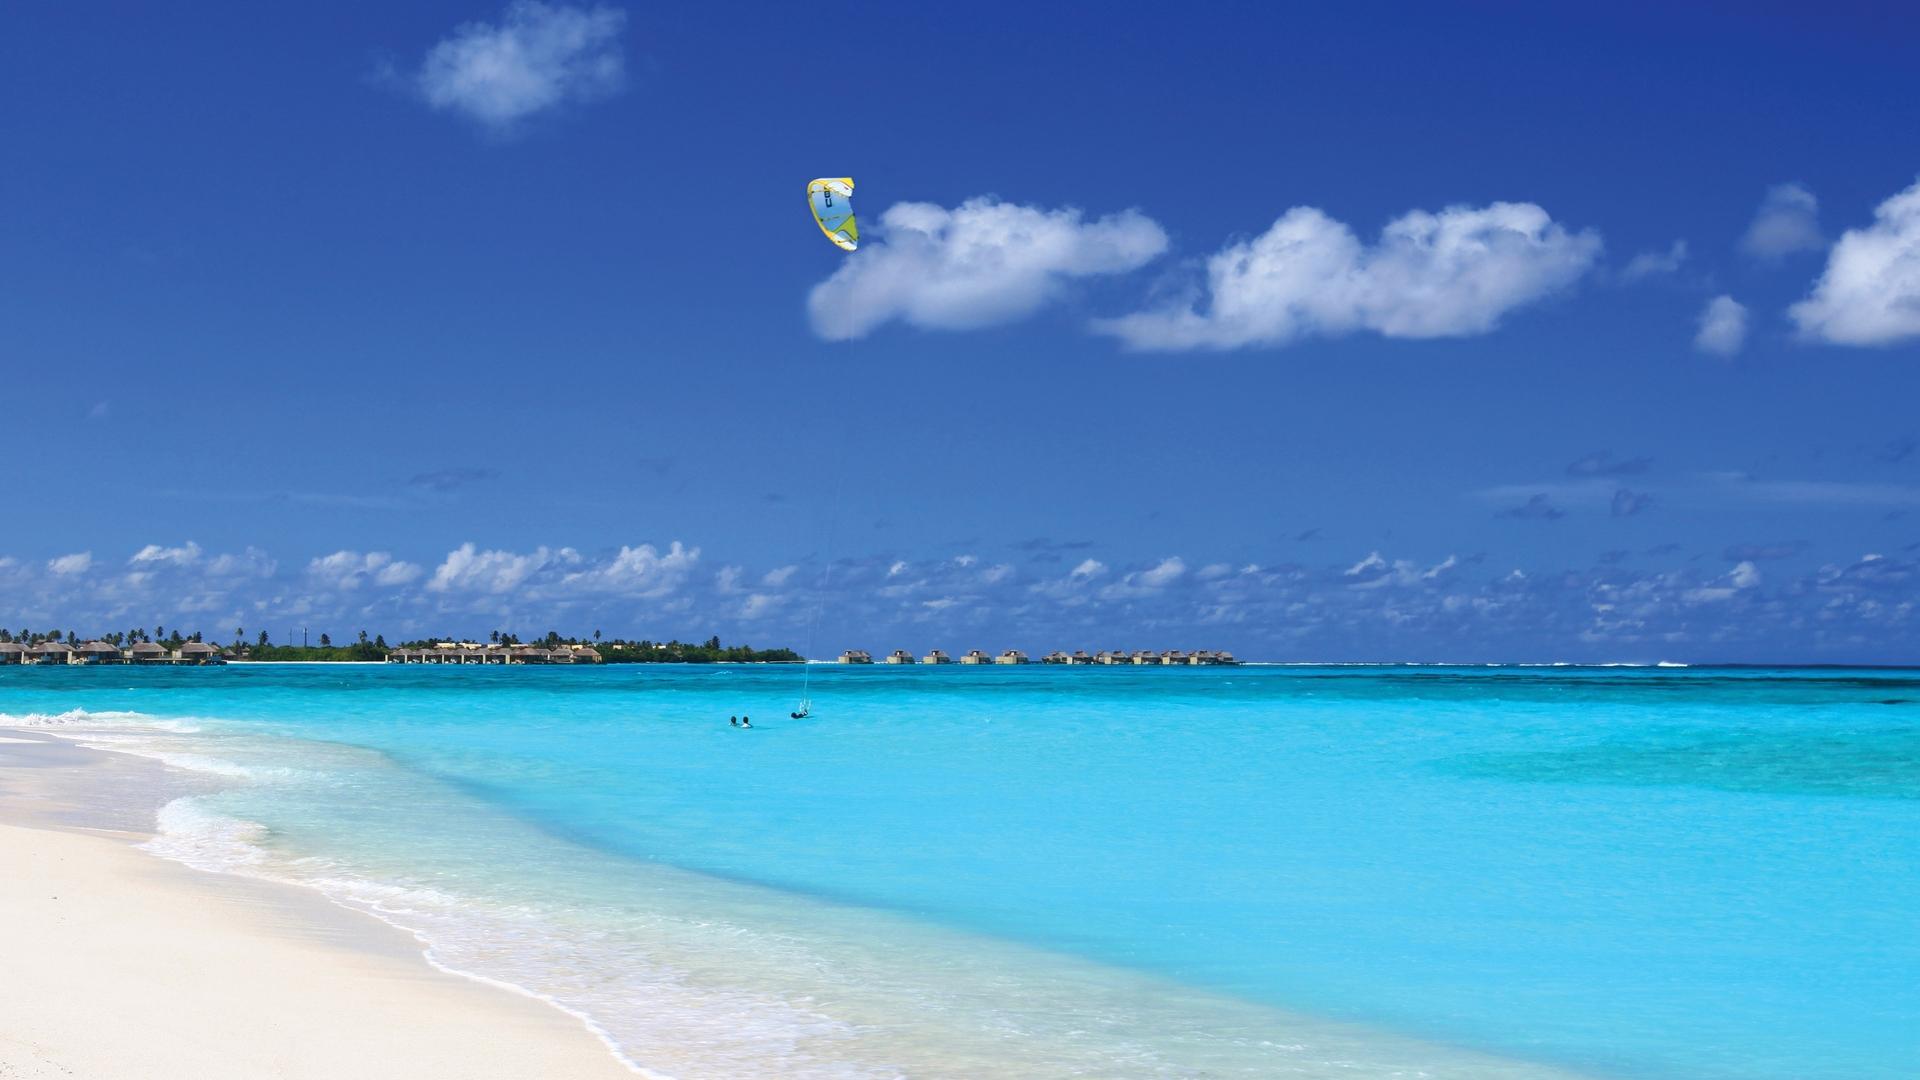 Blue Sky Over the Ocean Desktop Background HD 1920x1080 1920x1080